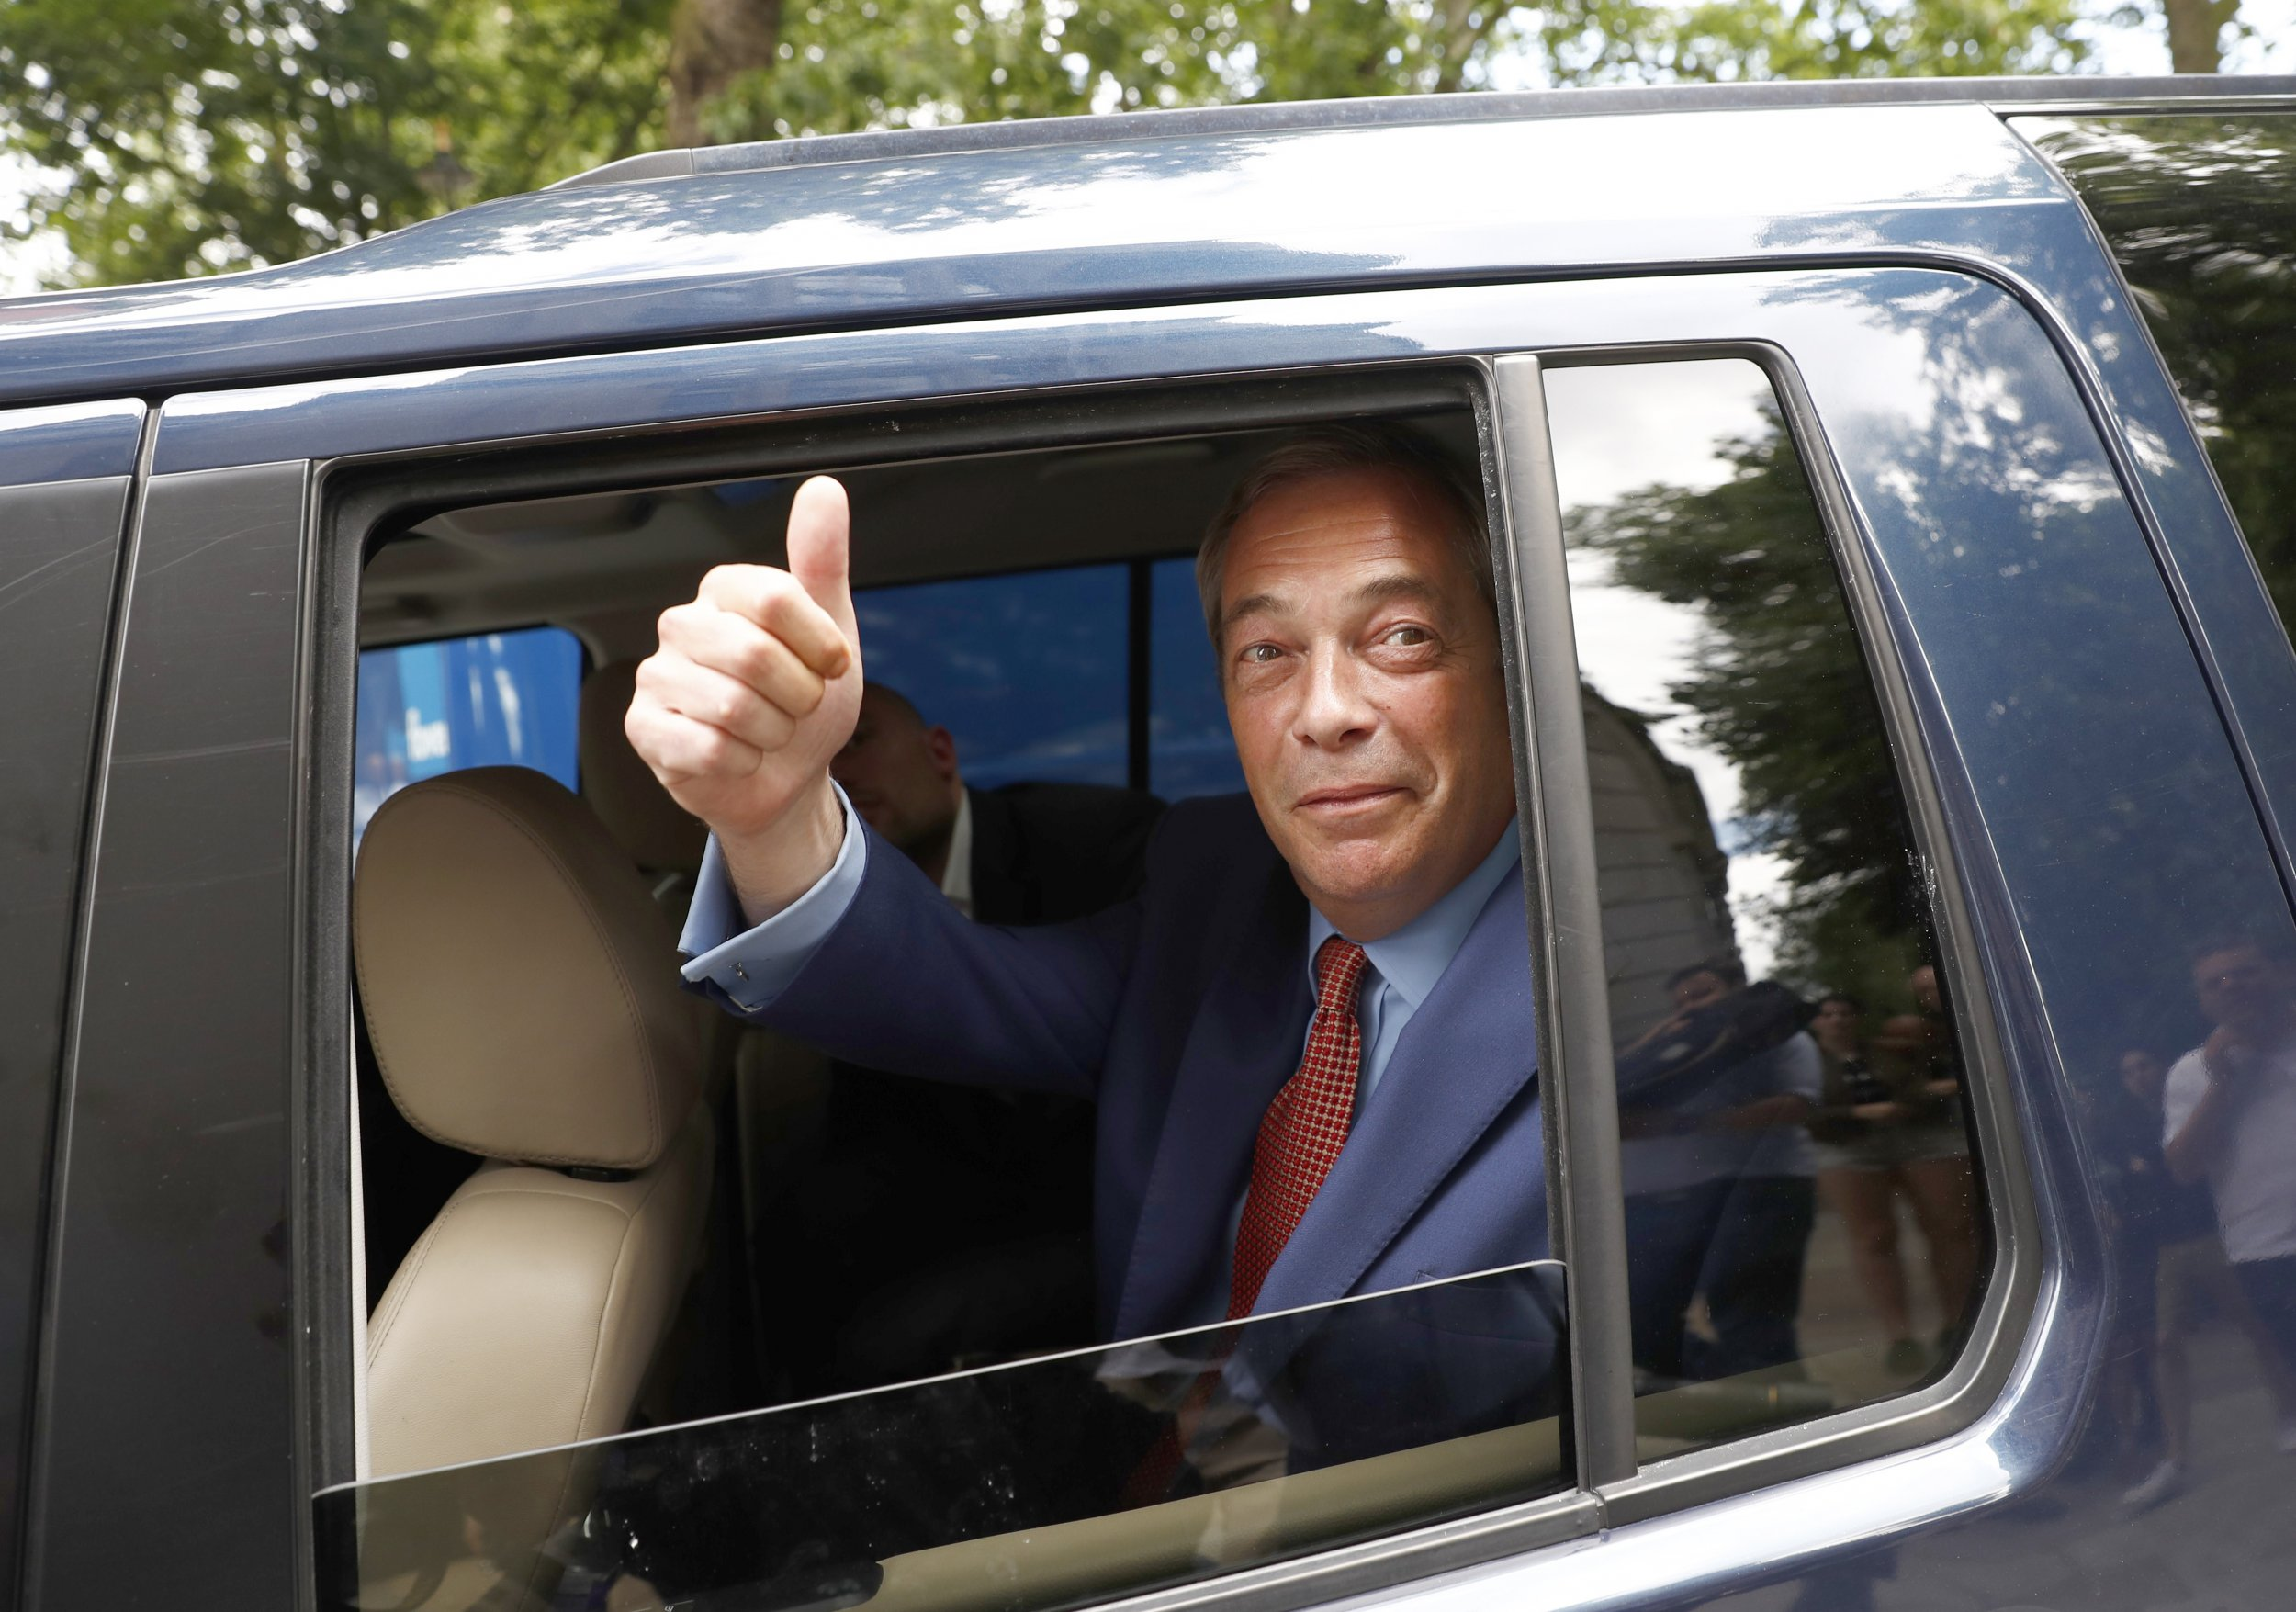 Nigel Farage takes his leave